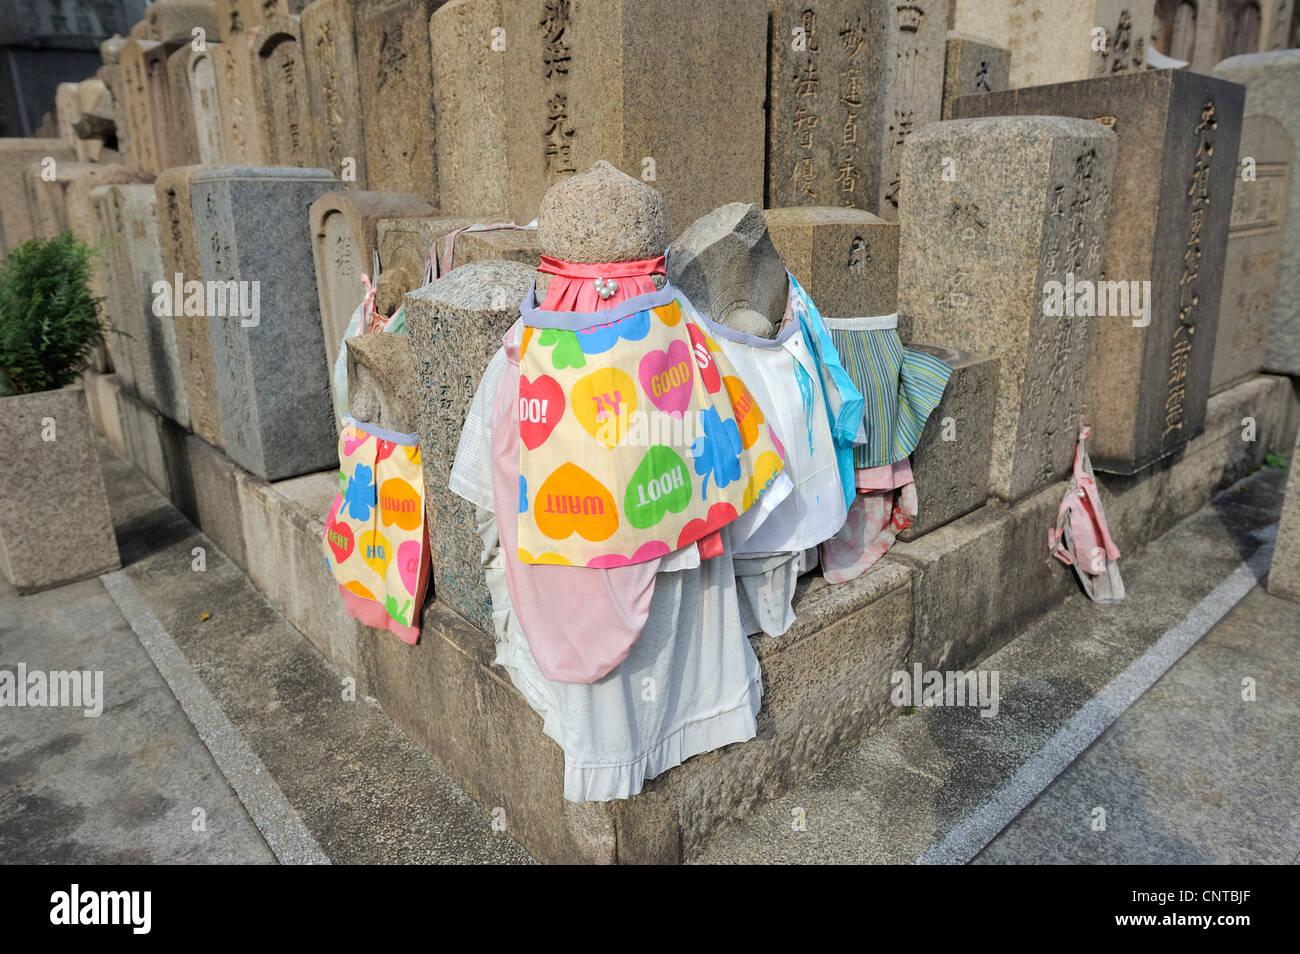 grave marker stones decorated with bibs at Shitenno-Ji temple, Osaka, Japan - Stock Image